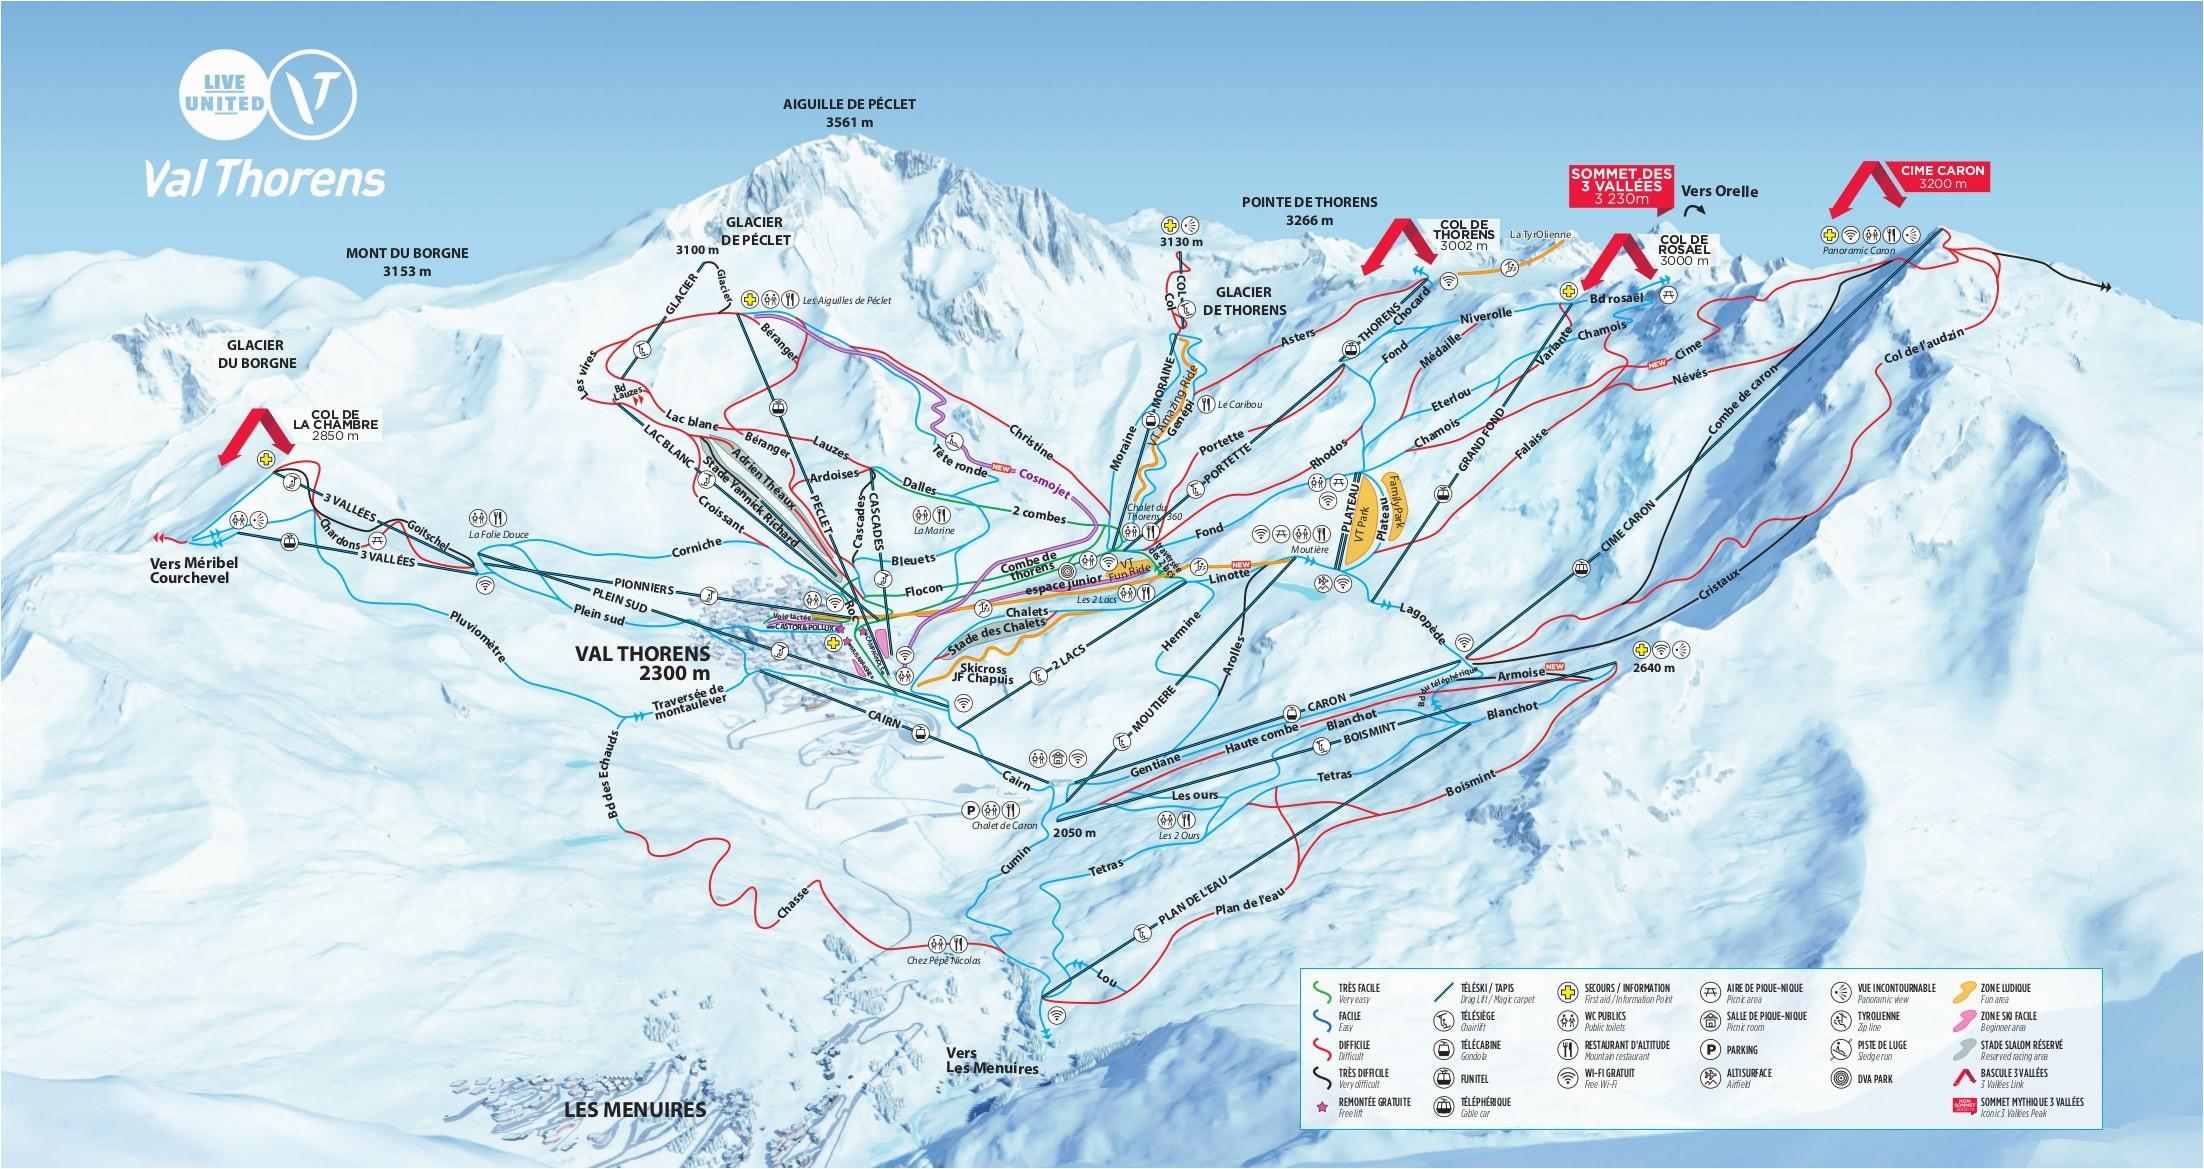 val thorens piste map 2019 ski europe winter ski